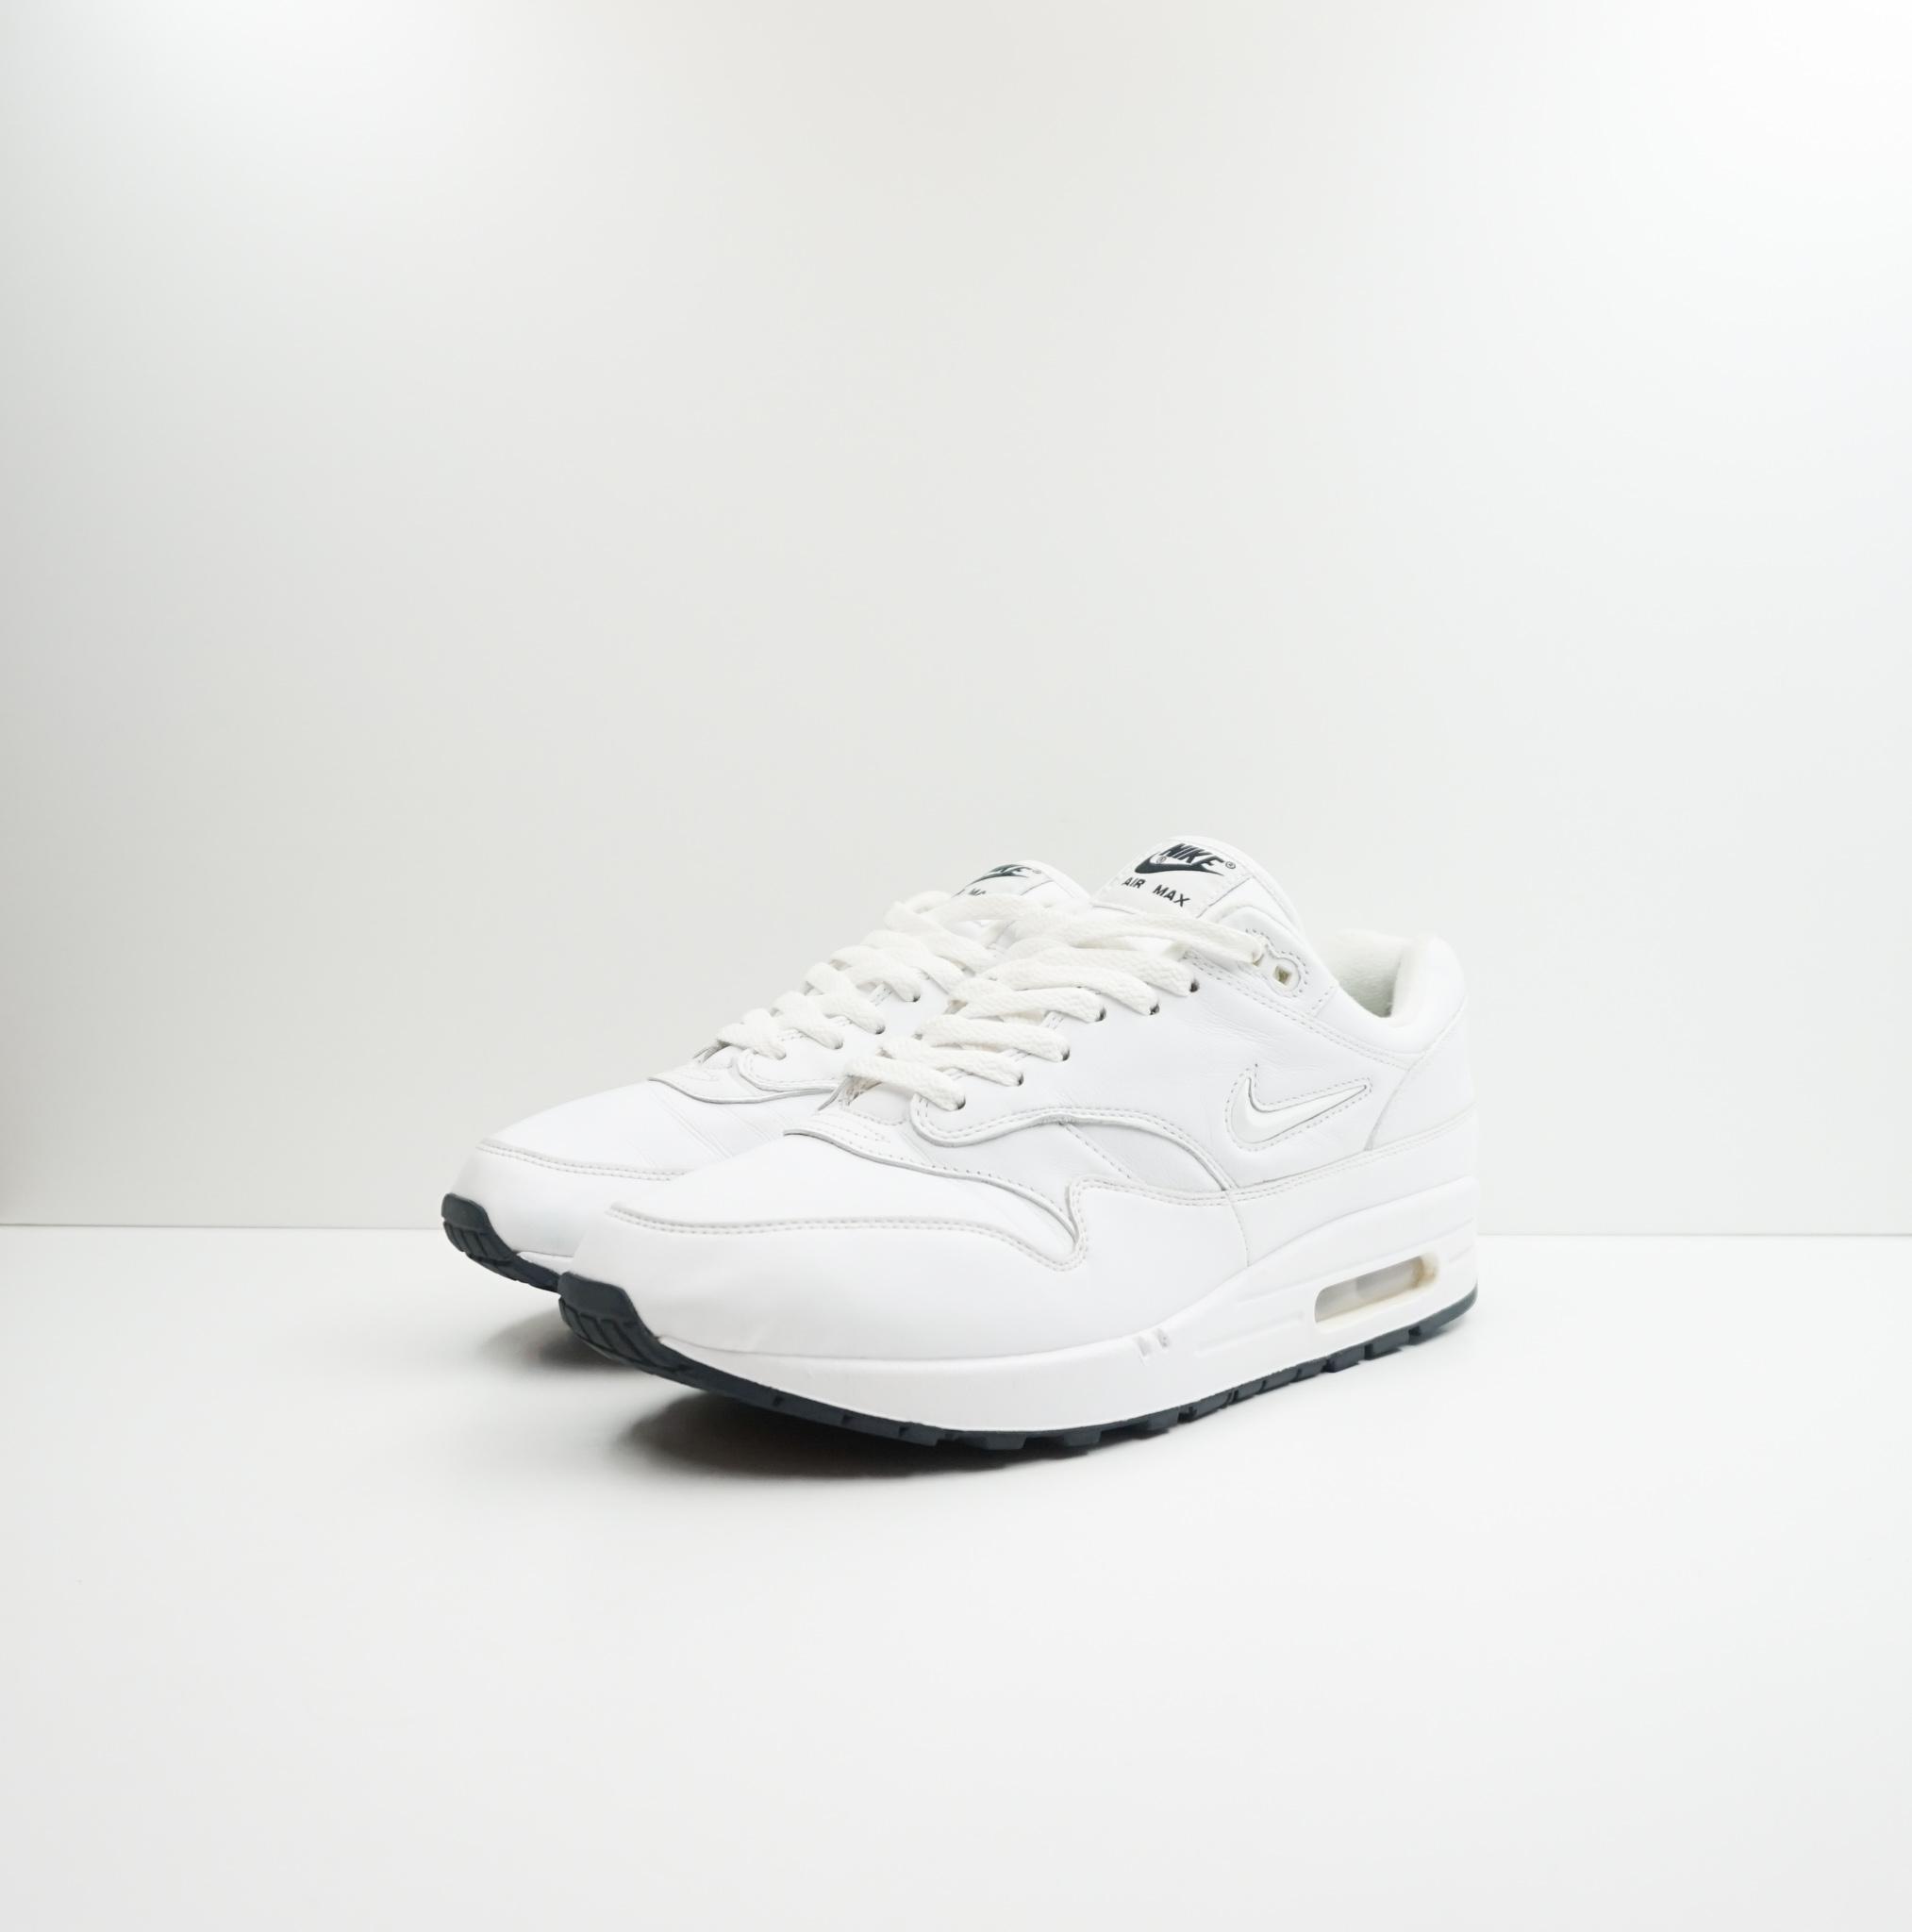 Nike Air Max 1 Premium SC Jewel 'White'